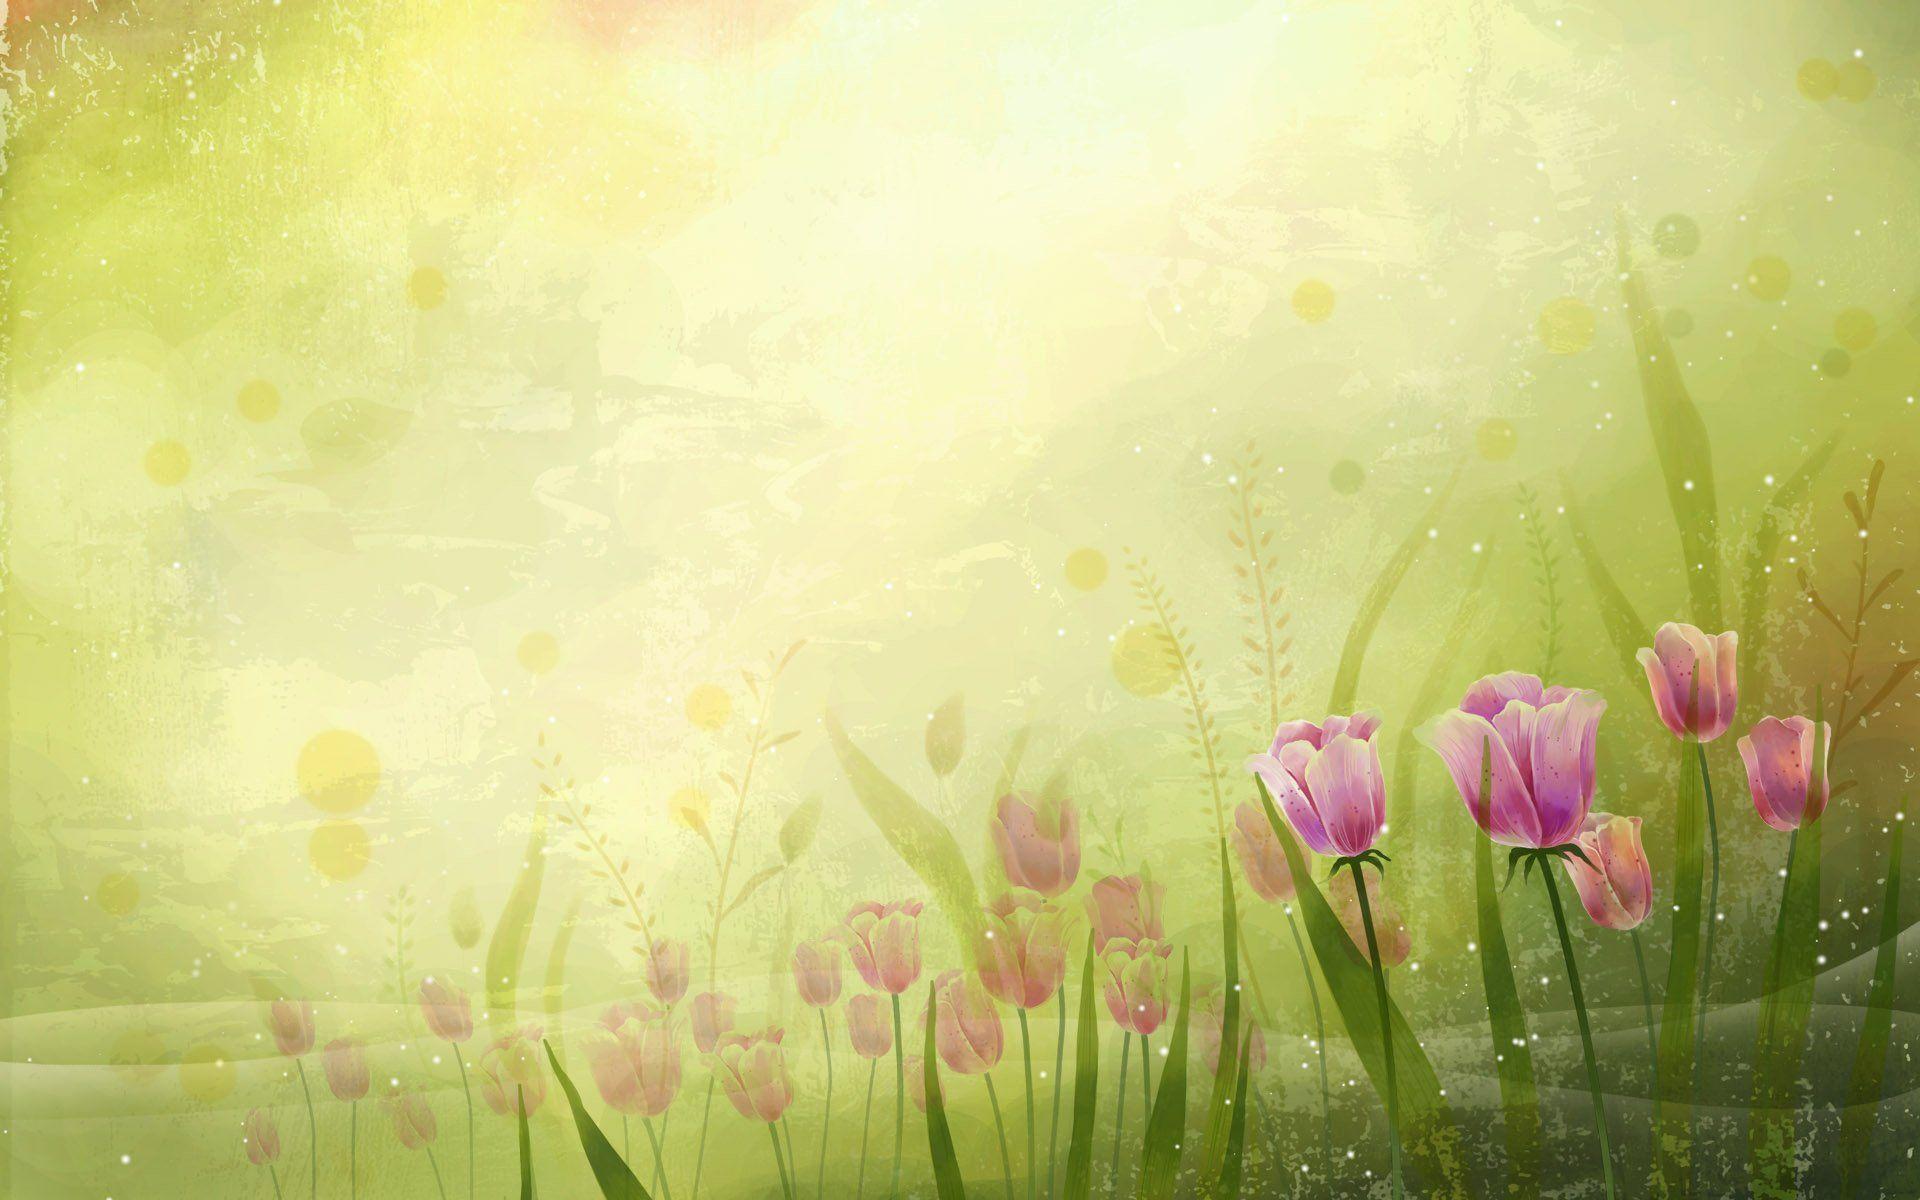 tulip wallpaper hd free